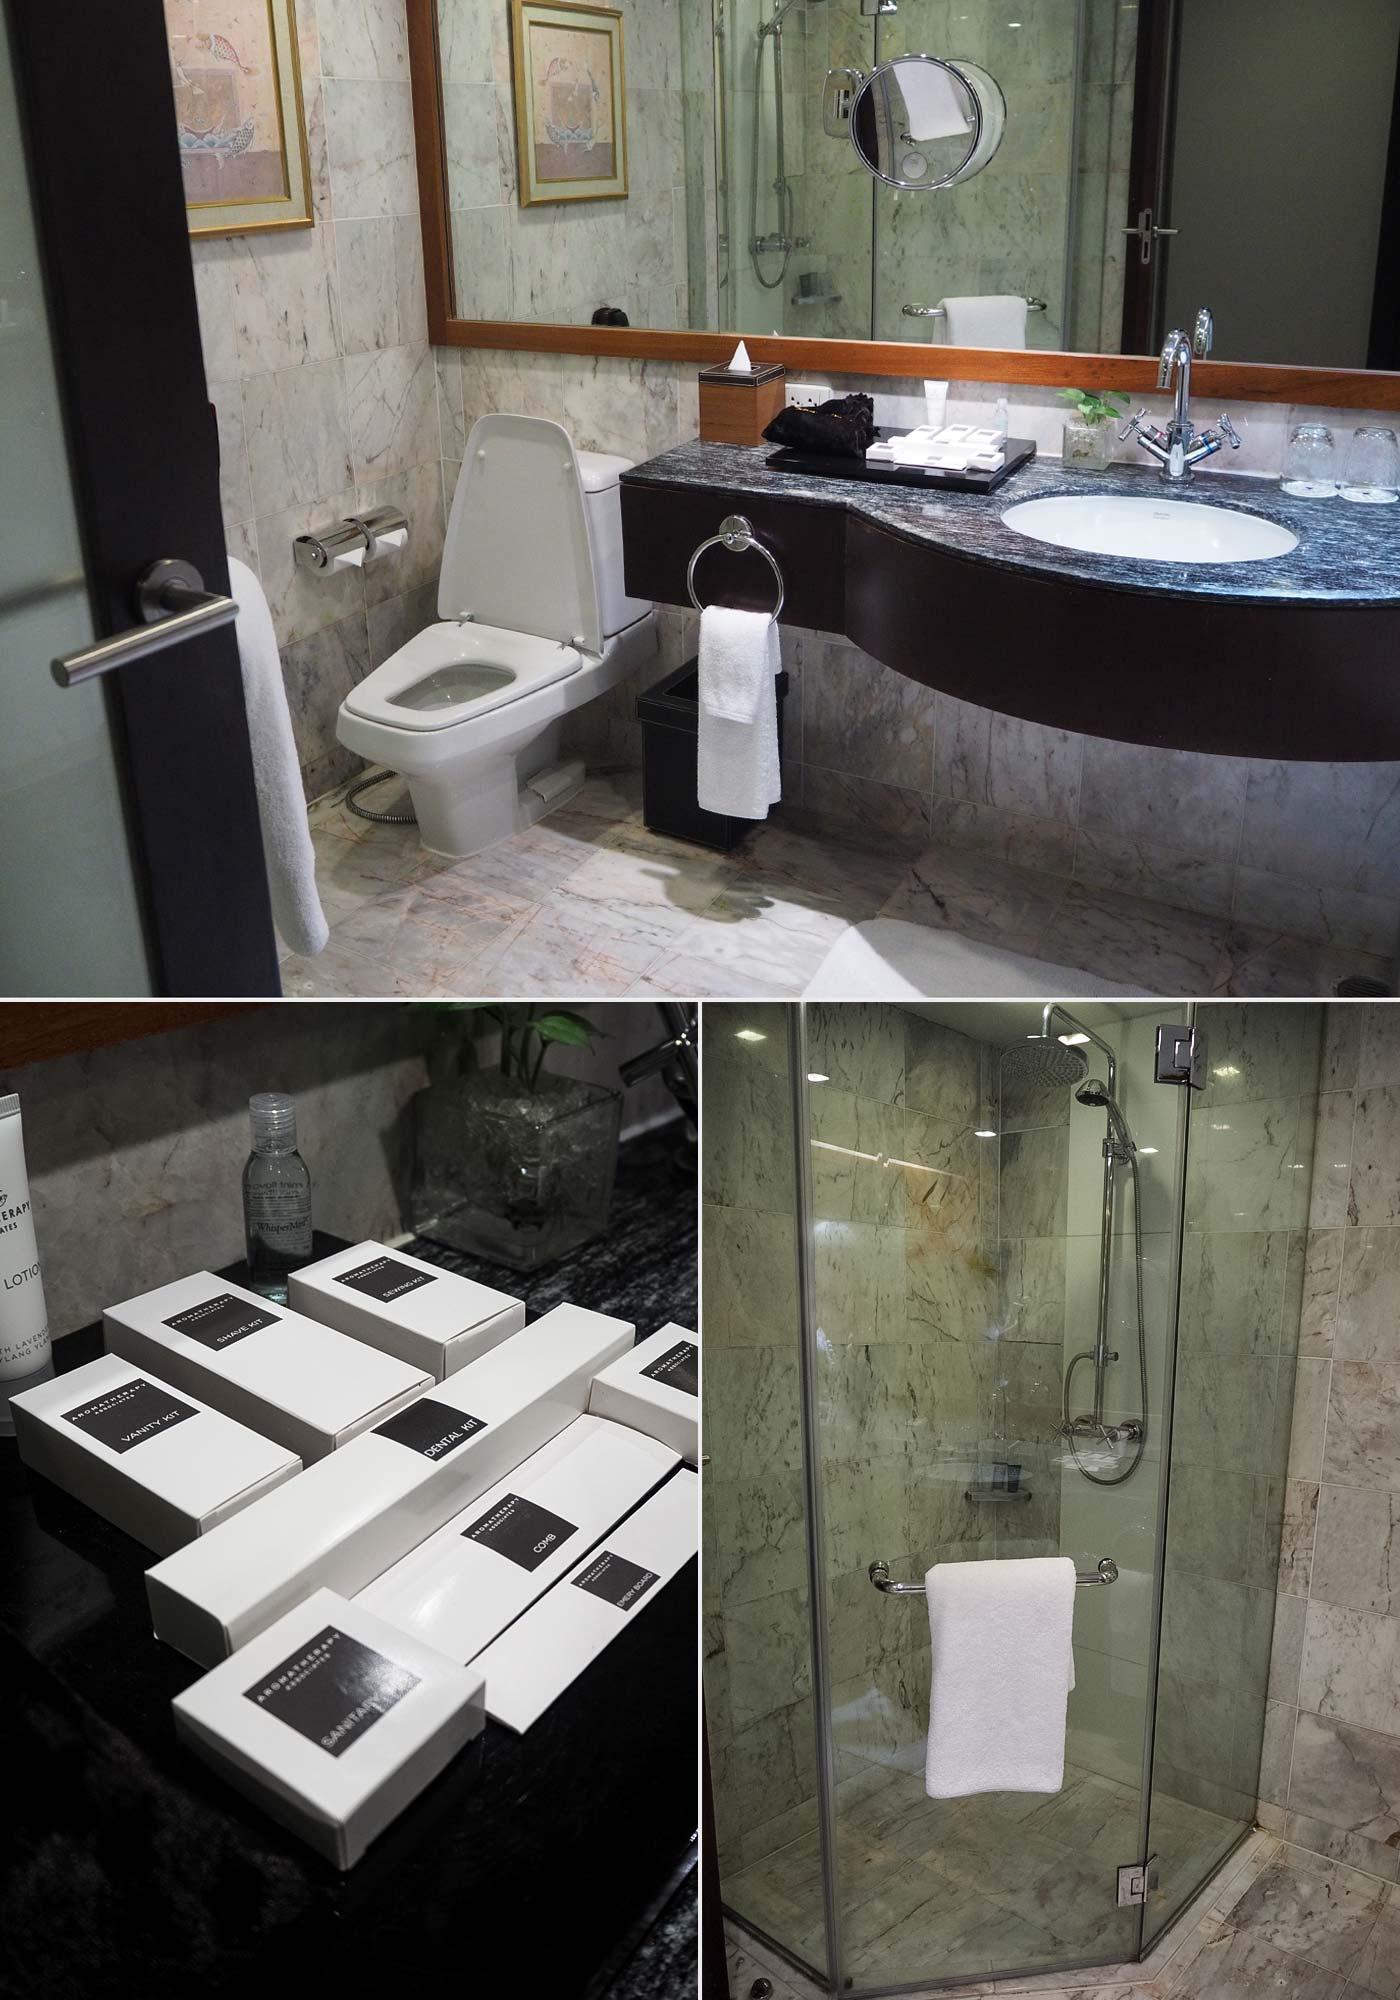 jw_marriott-bangkok-bathroom